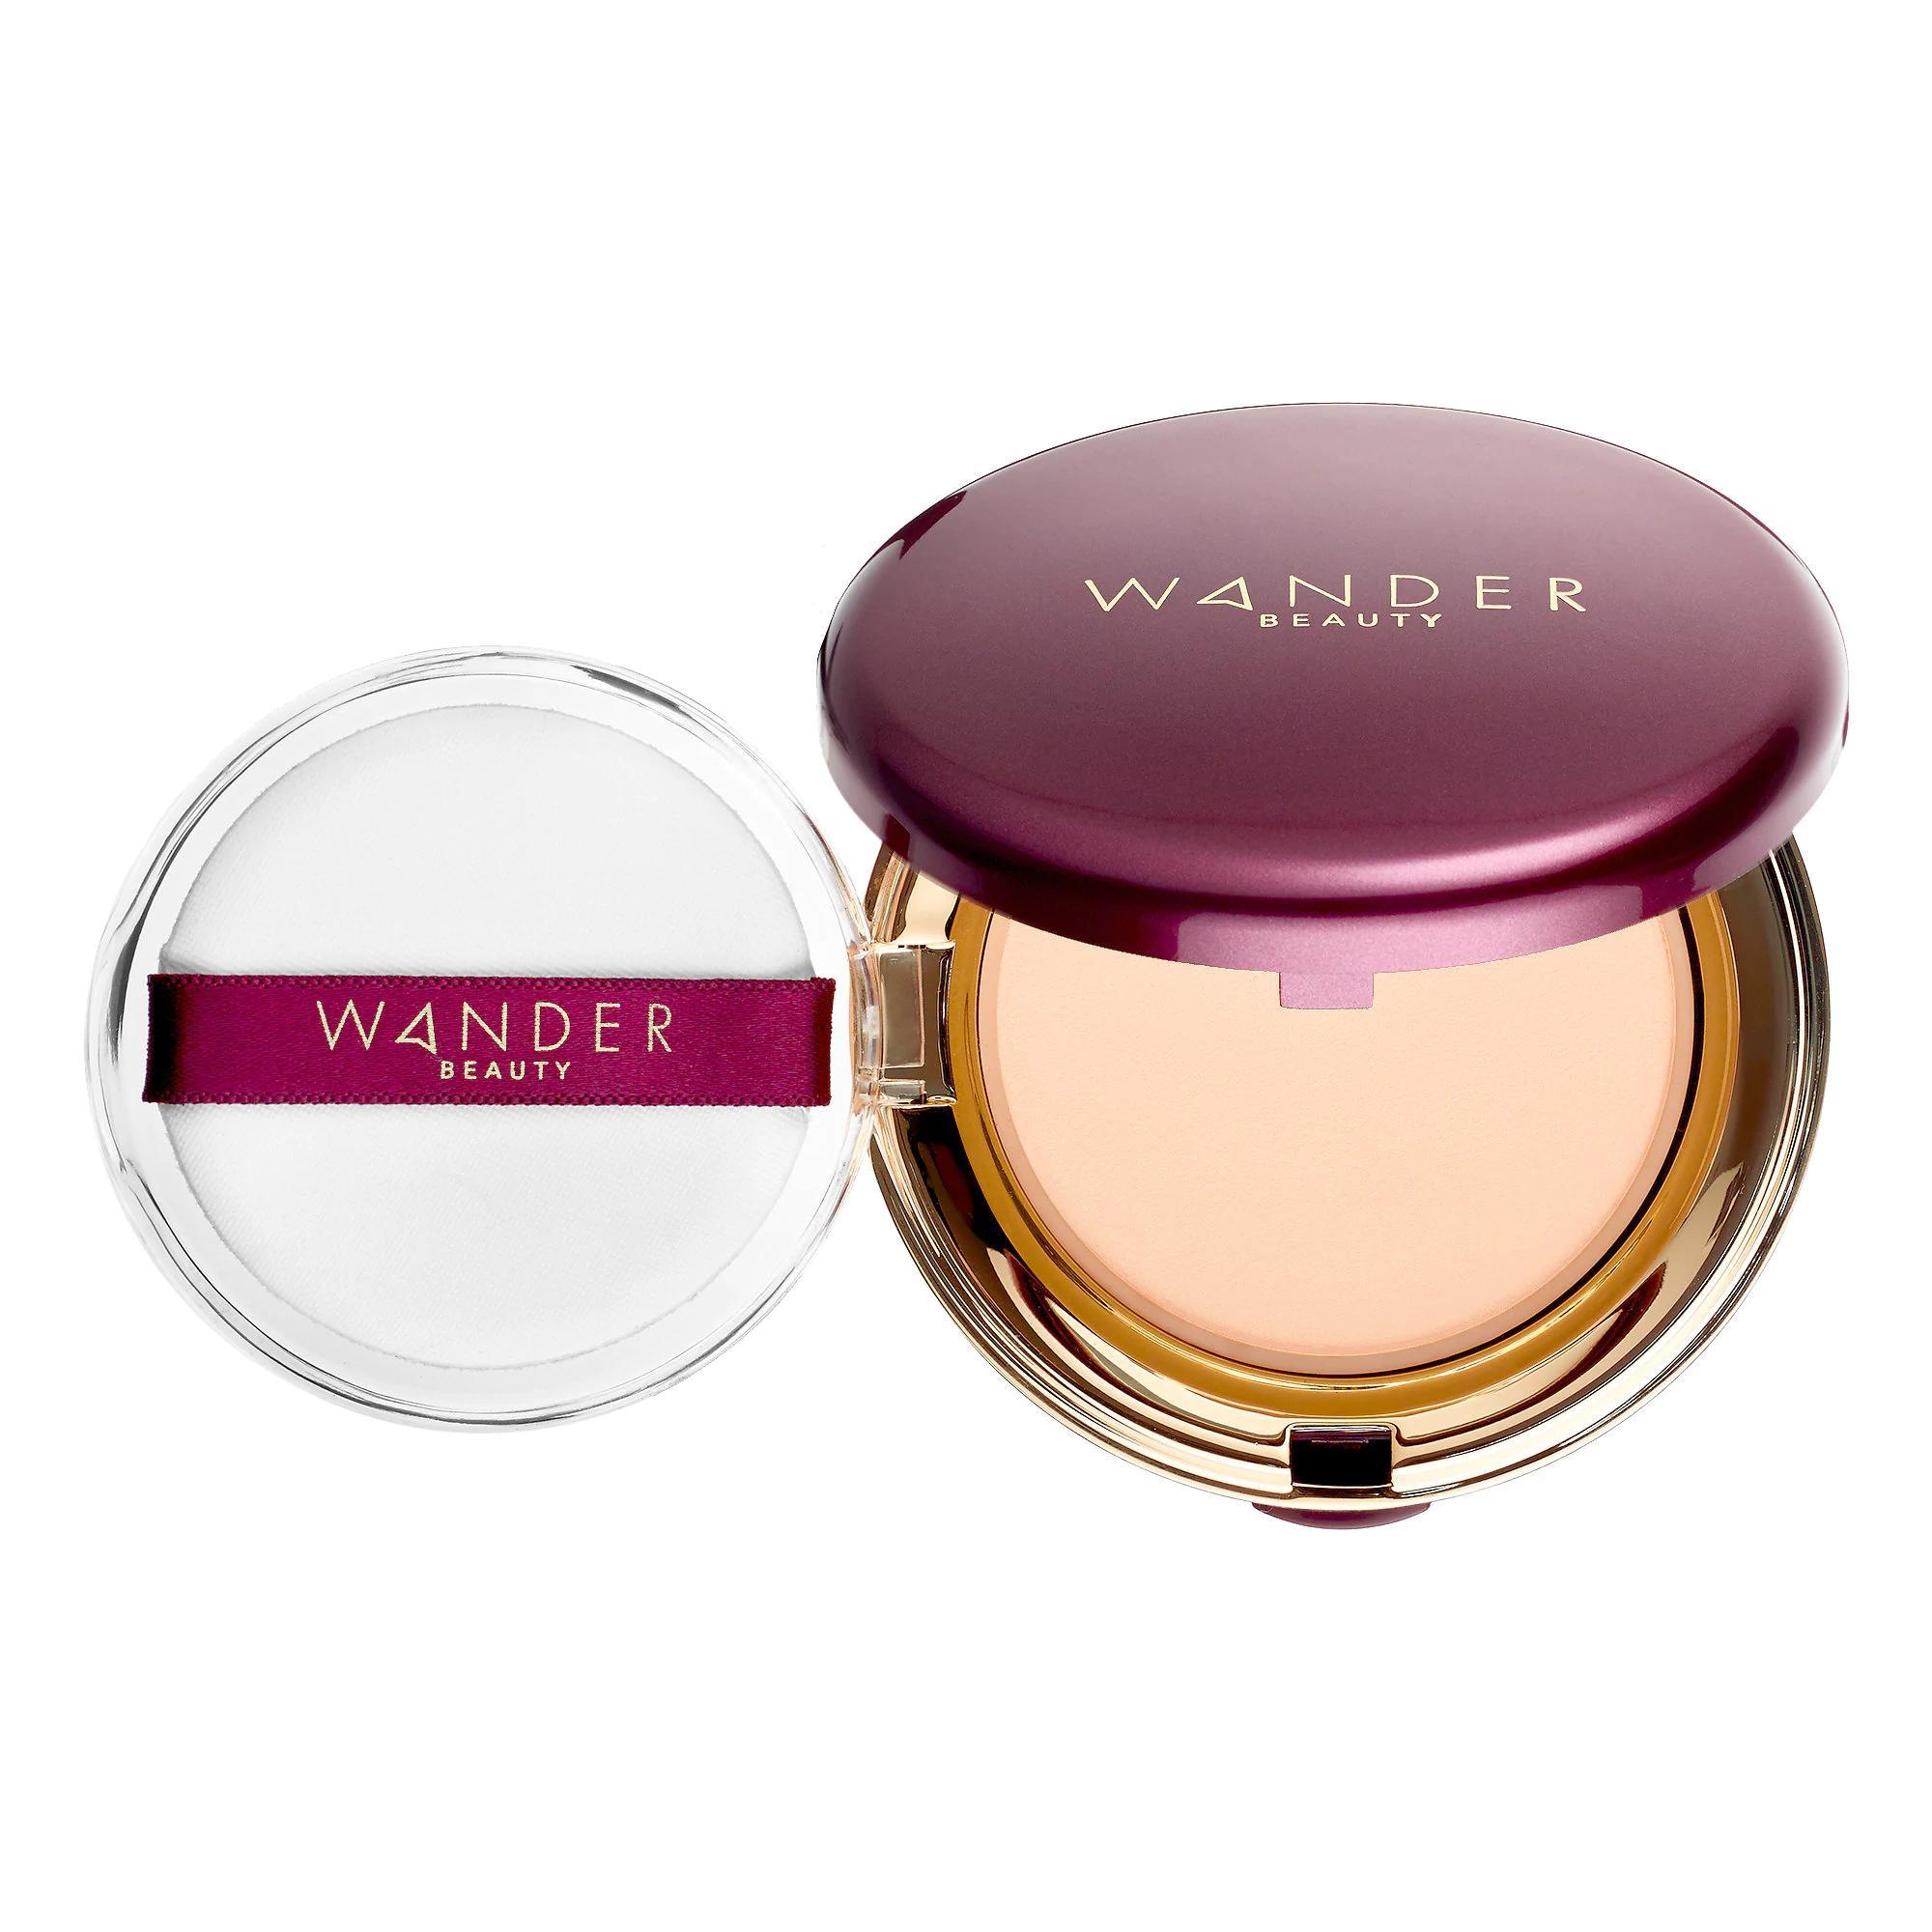 Wander Beauty Wanderlust Powder Foundation Light